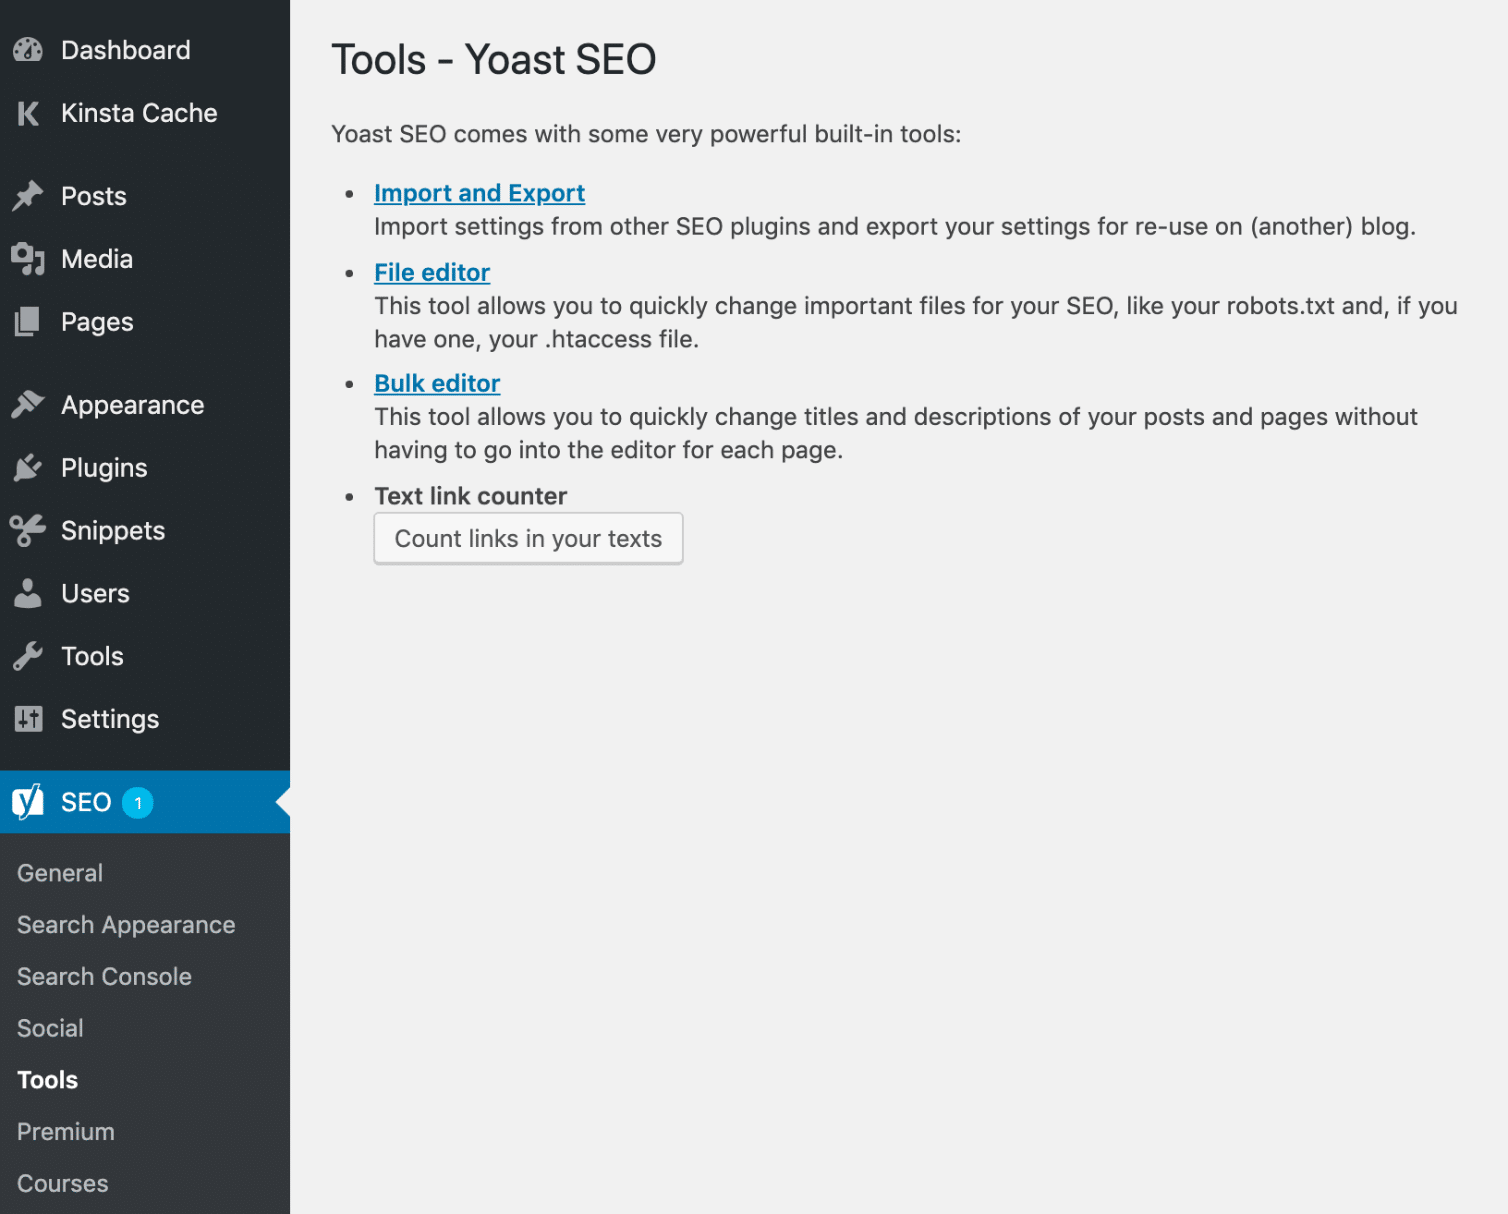 Yoast SEOツールのリスト